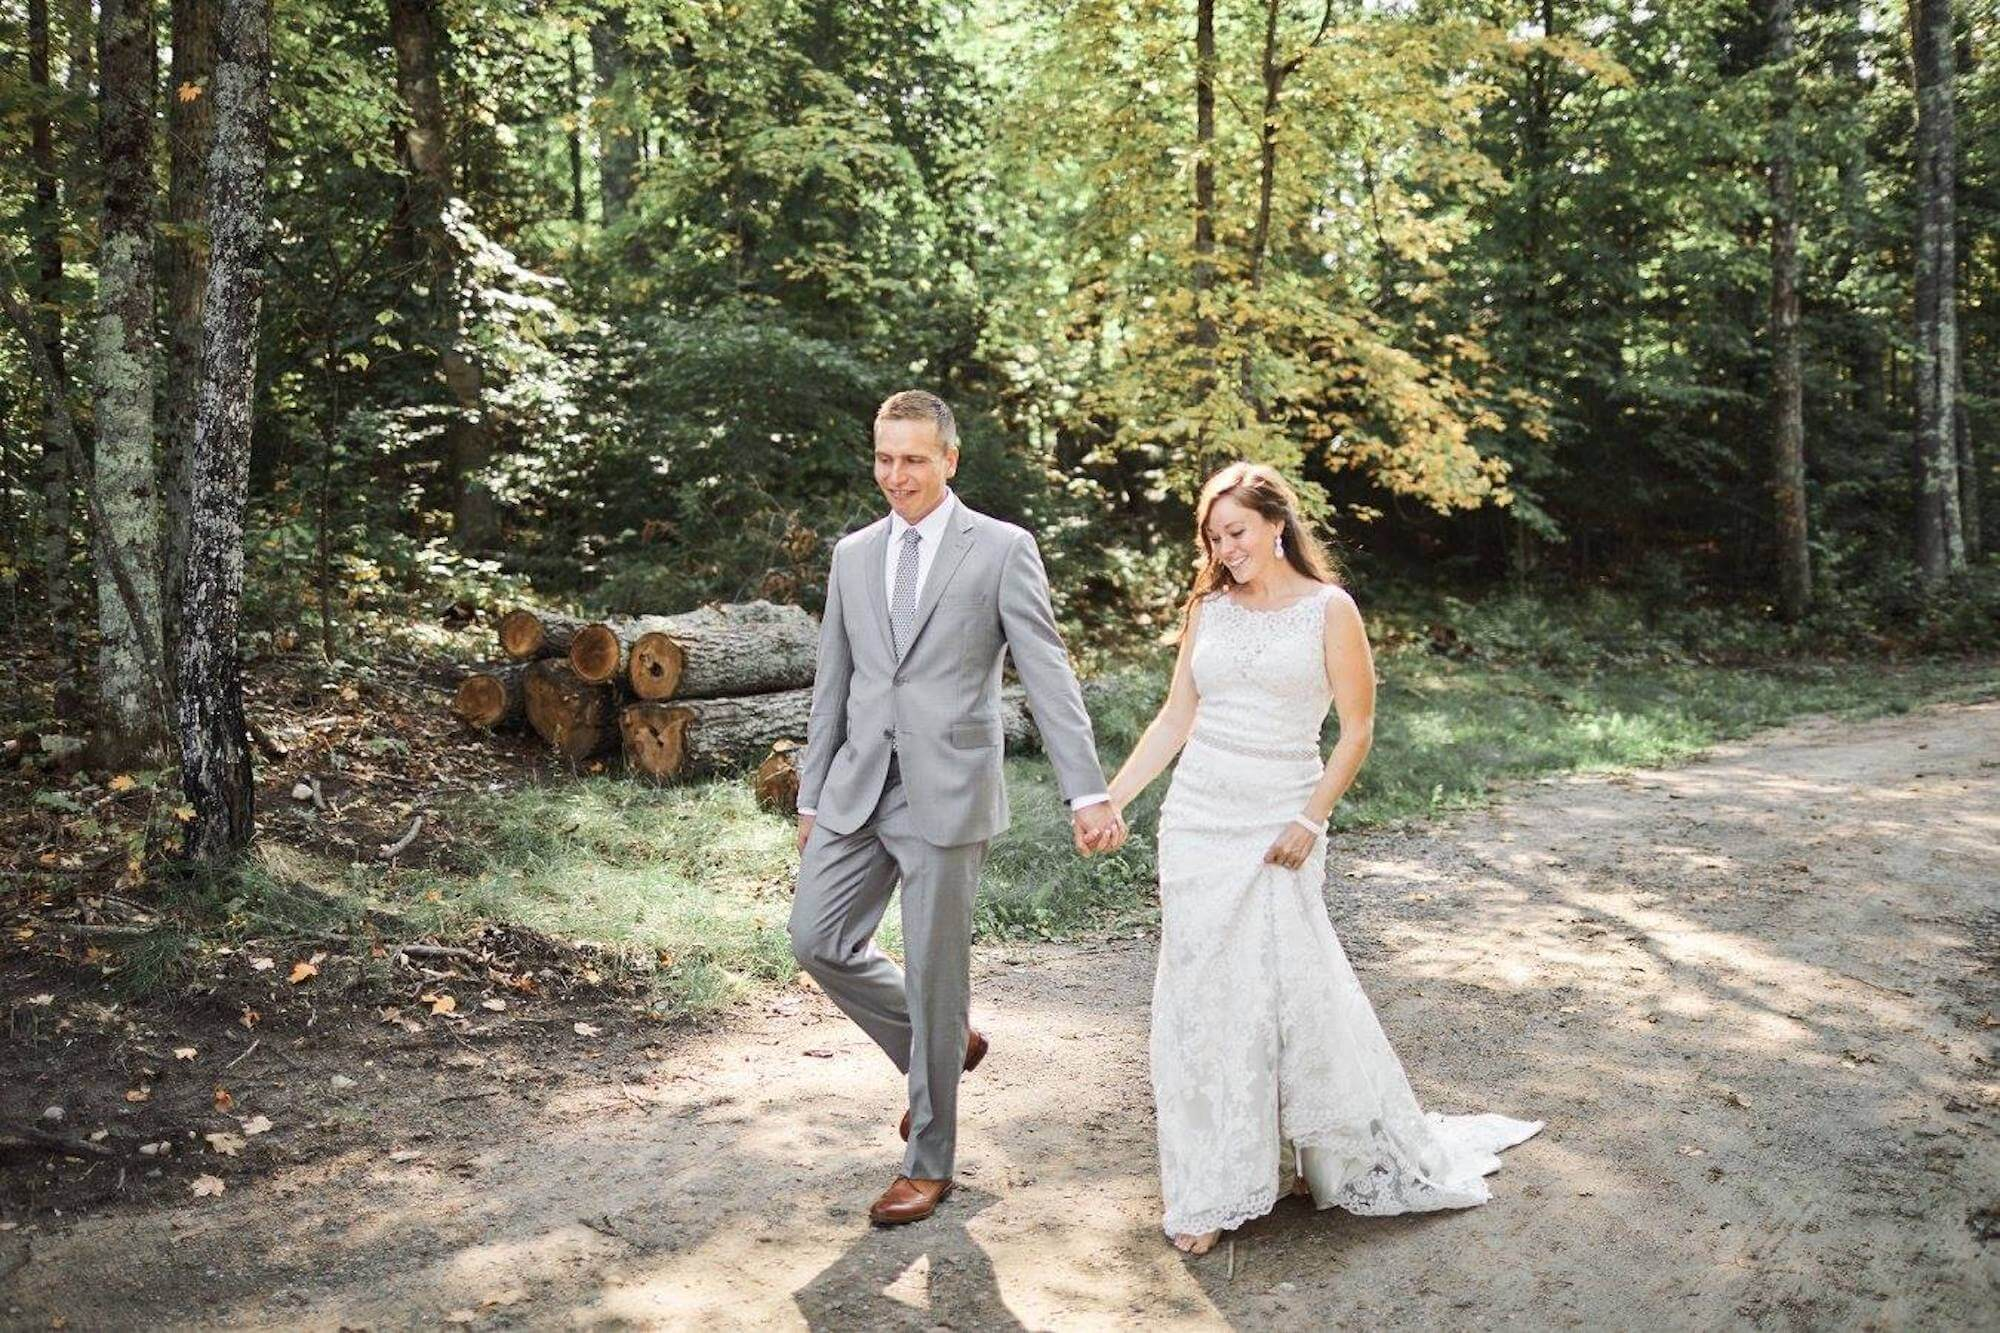 engle-olson-wedding-video-perry-james-photography-33.jpg